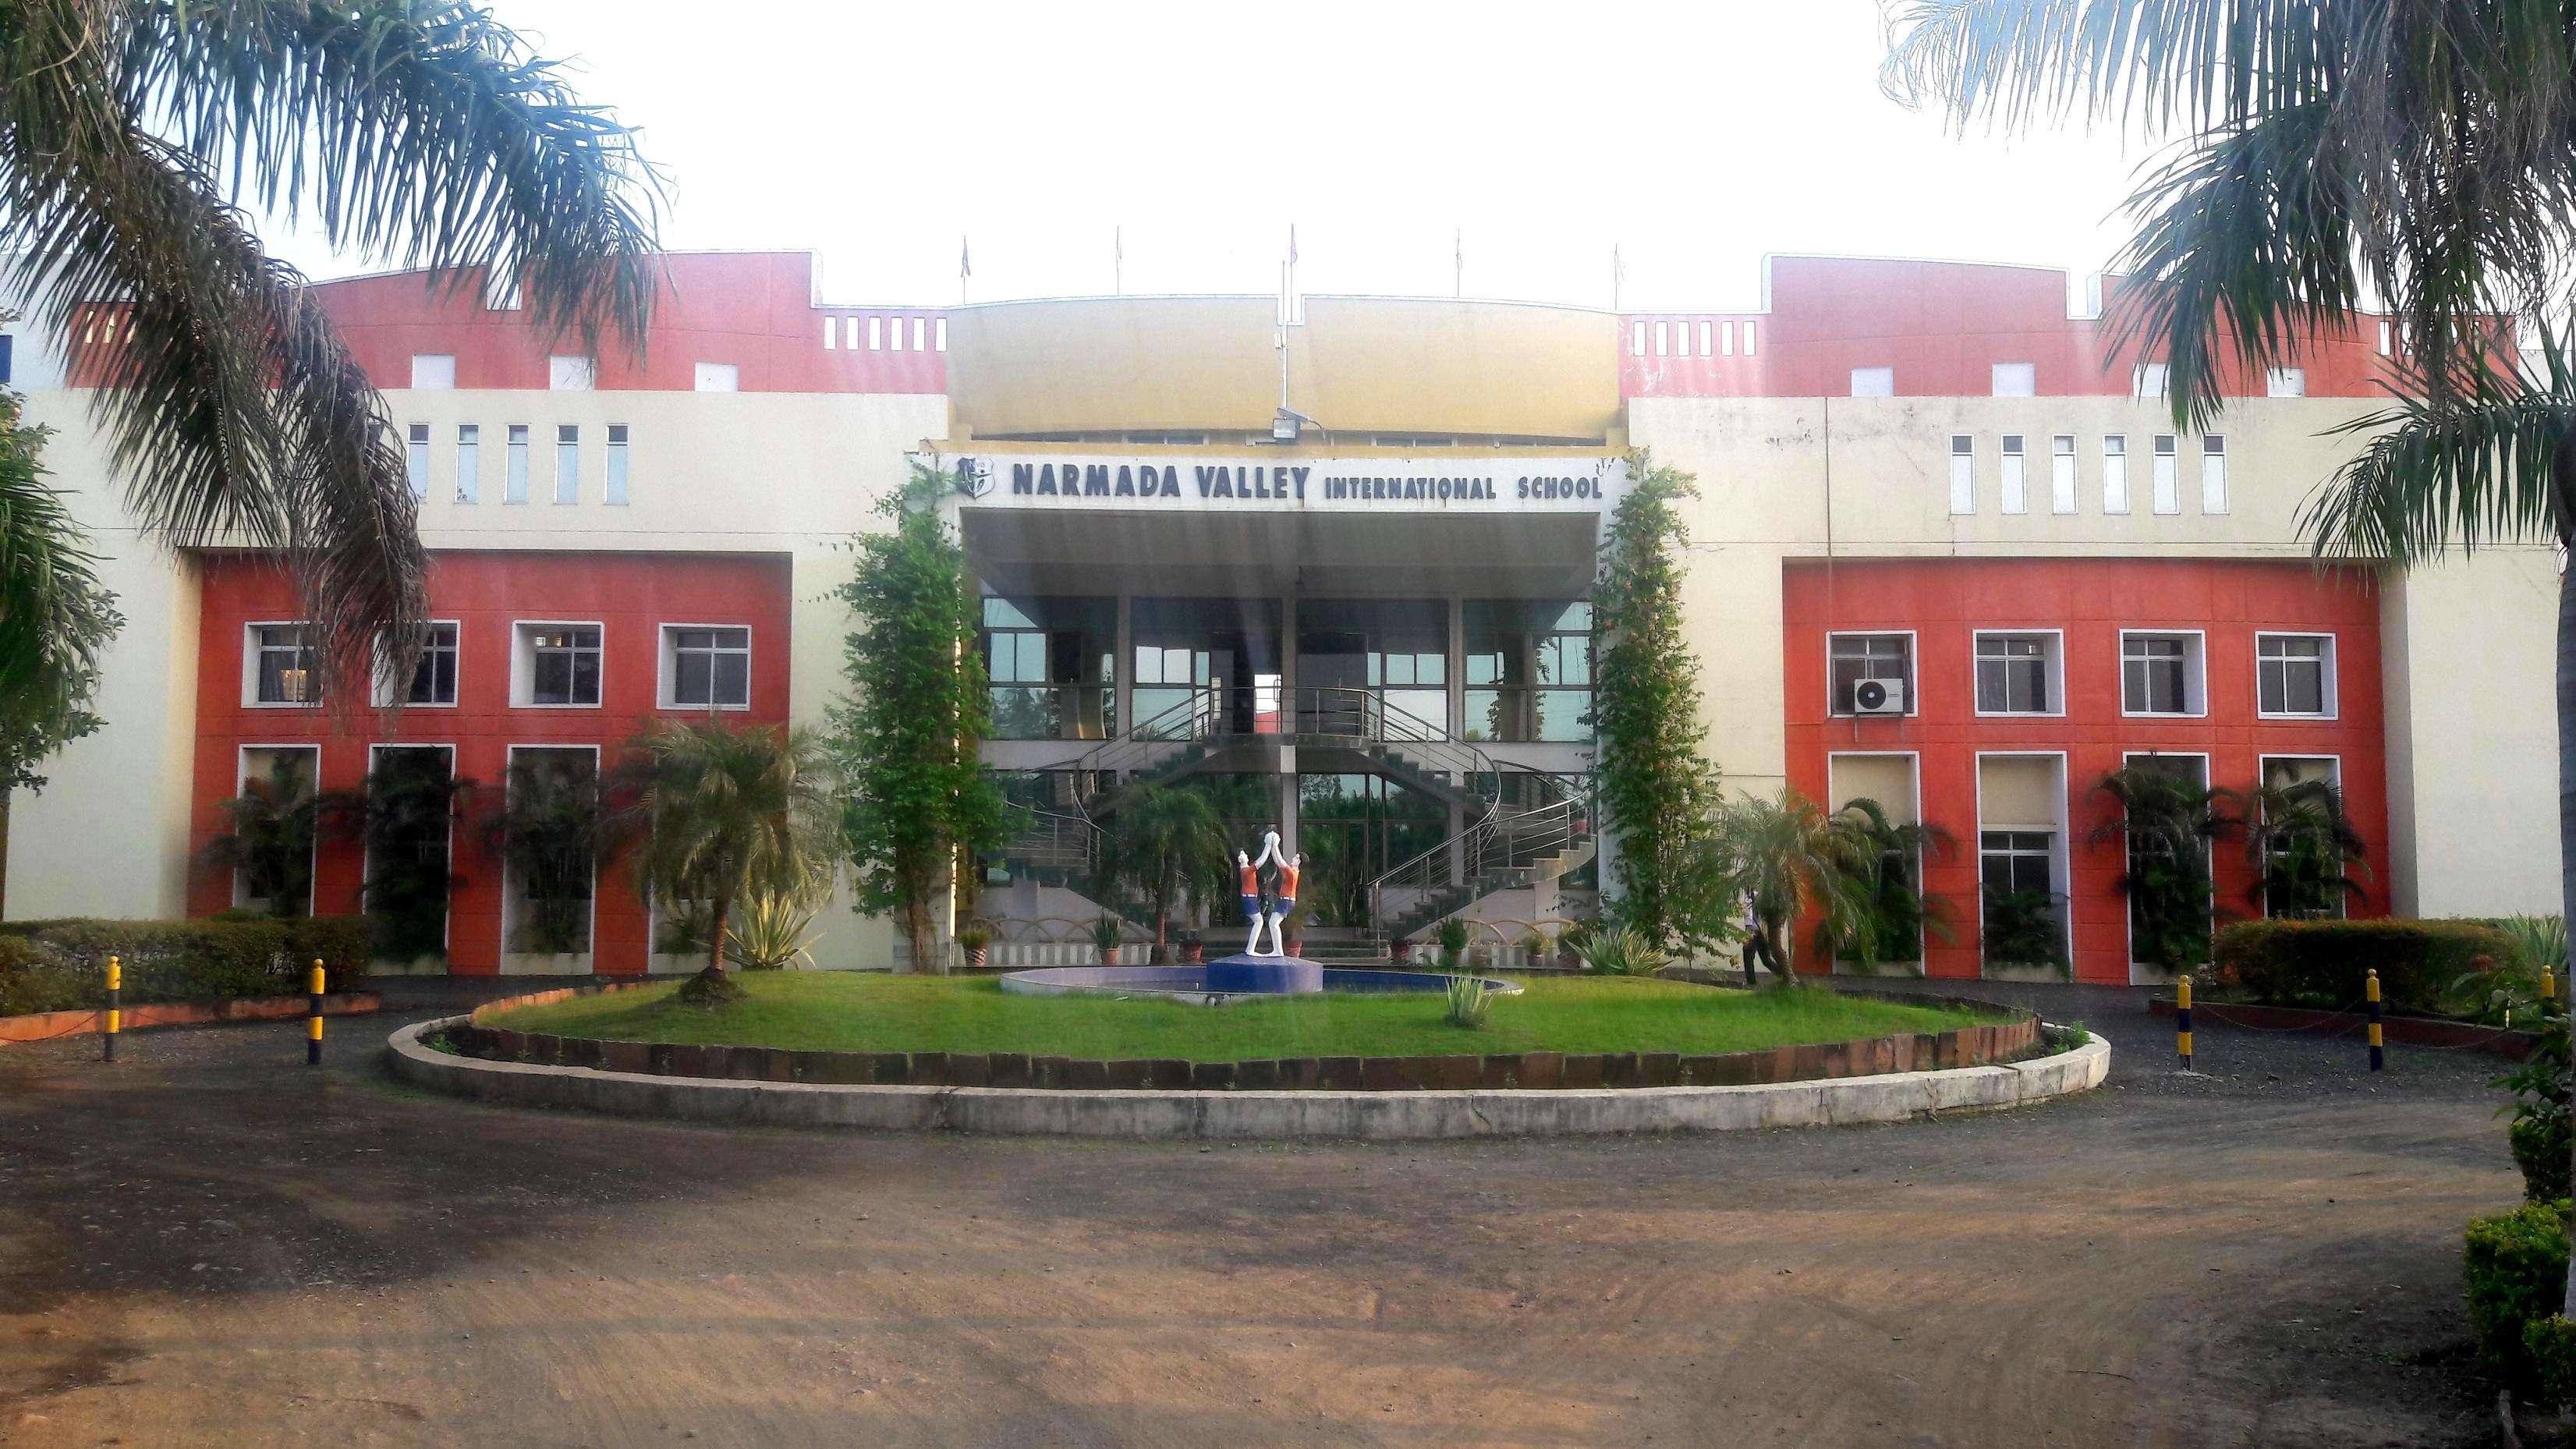 NARMADA VALLEY INTERNATIONAL SCHOOL MAHESHWAR ROAD BARWAHA DISTT KHARGAON MP 1030247